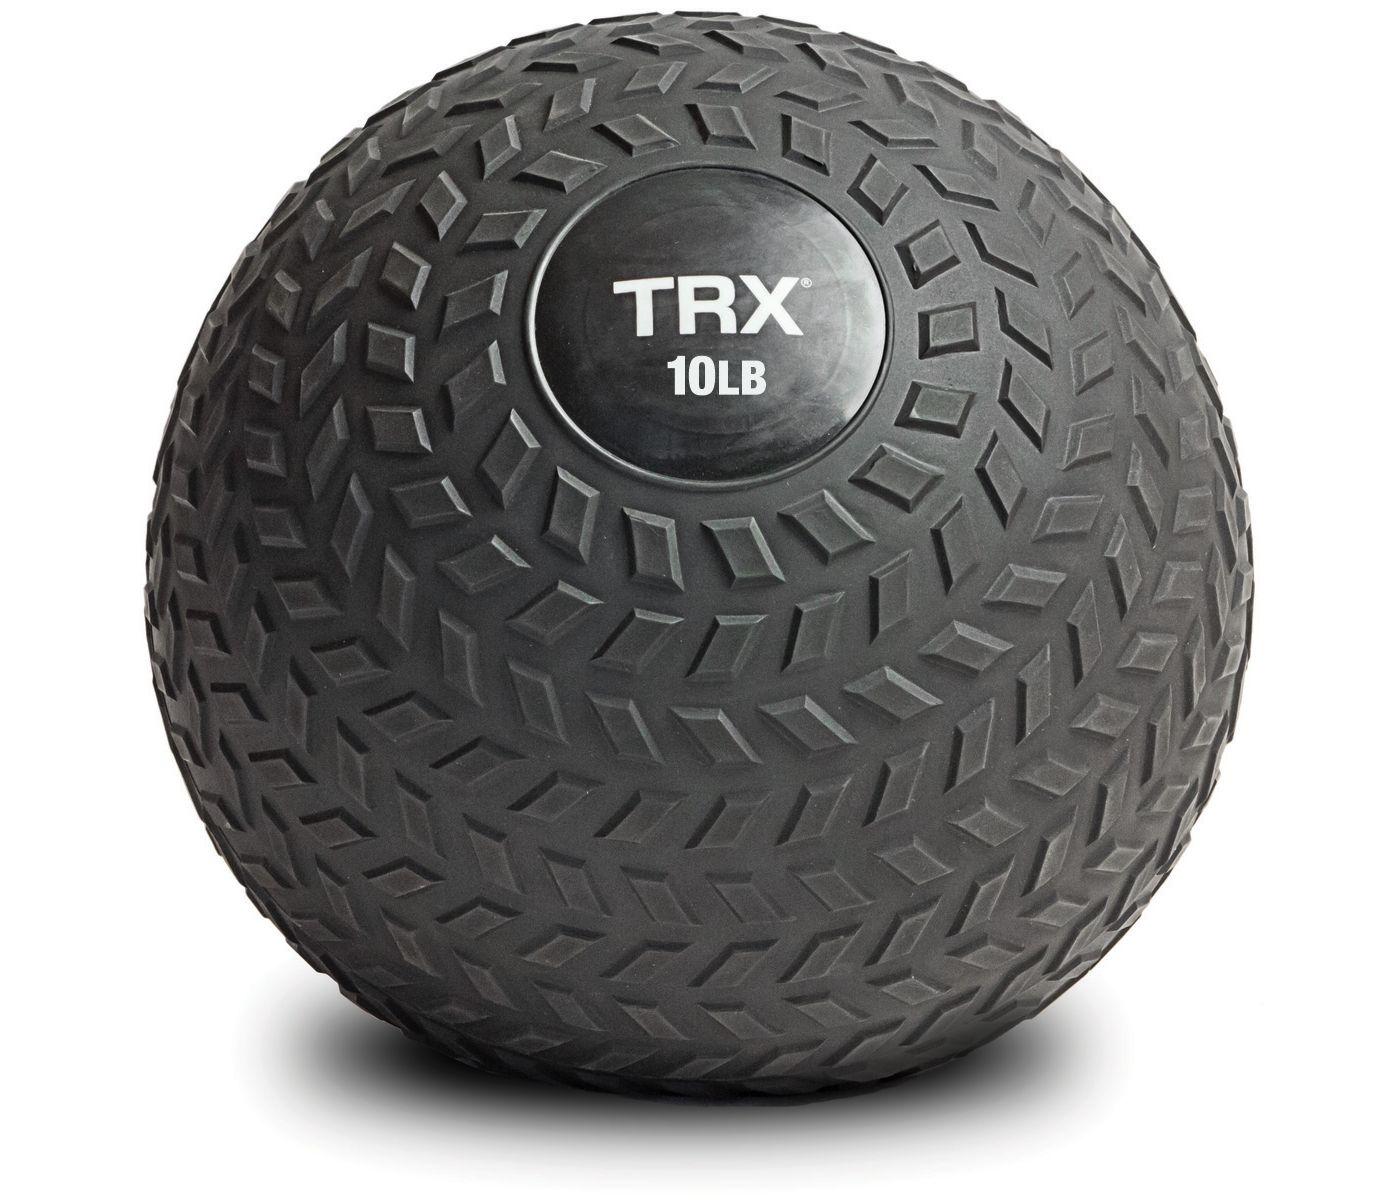 TRX 10 lb. Slam Ball